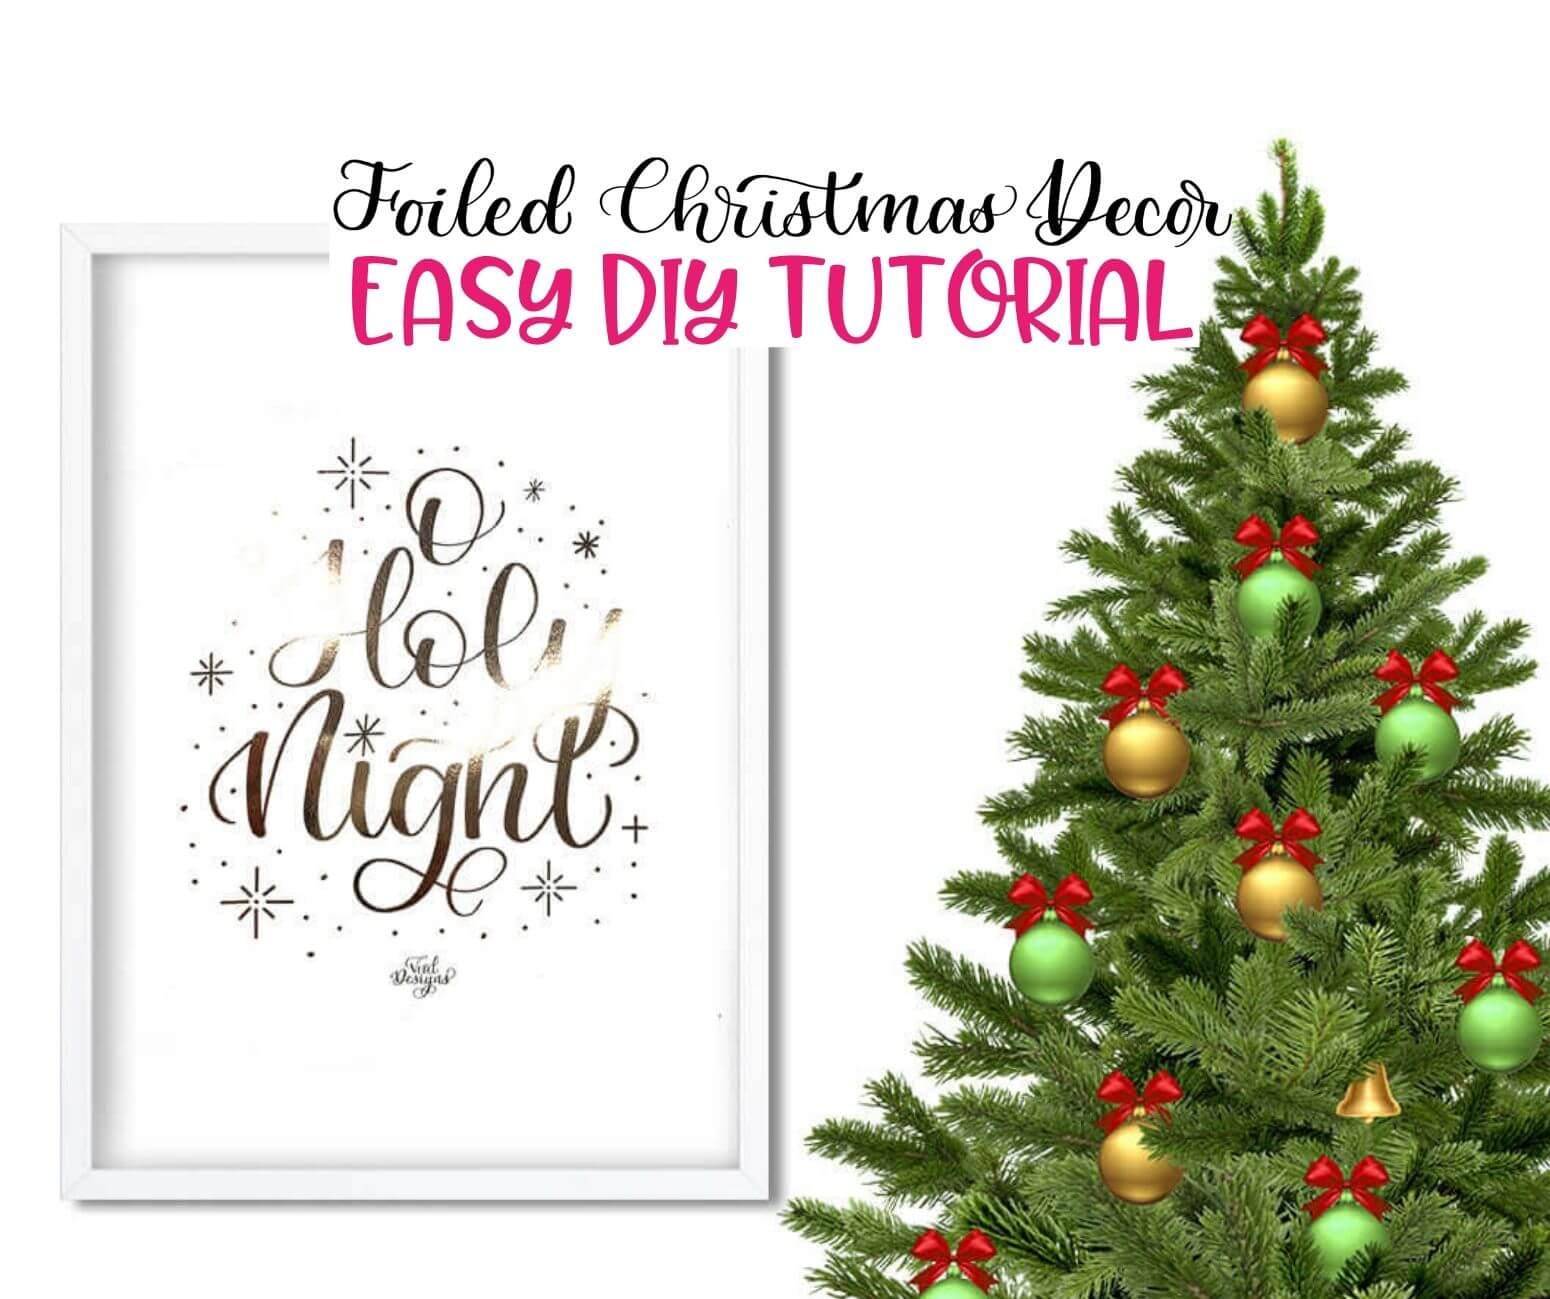 Foiled Christmas Decor DIY Tutorial